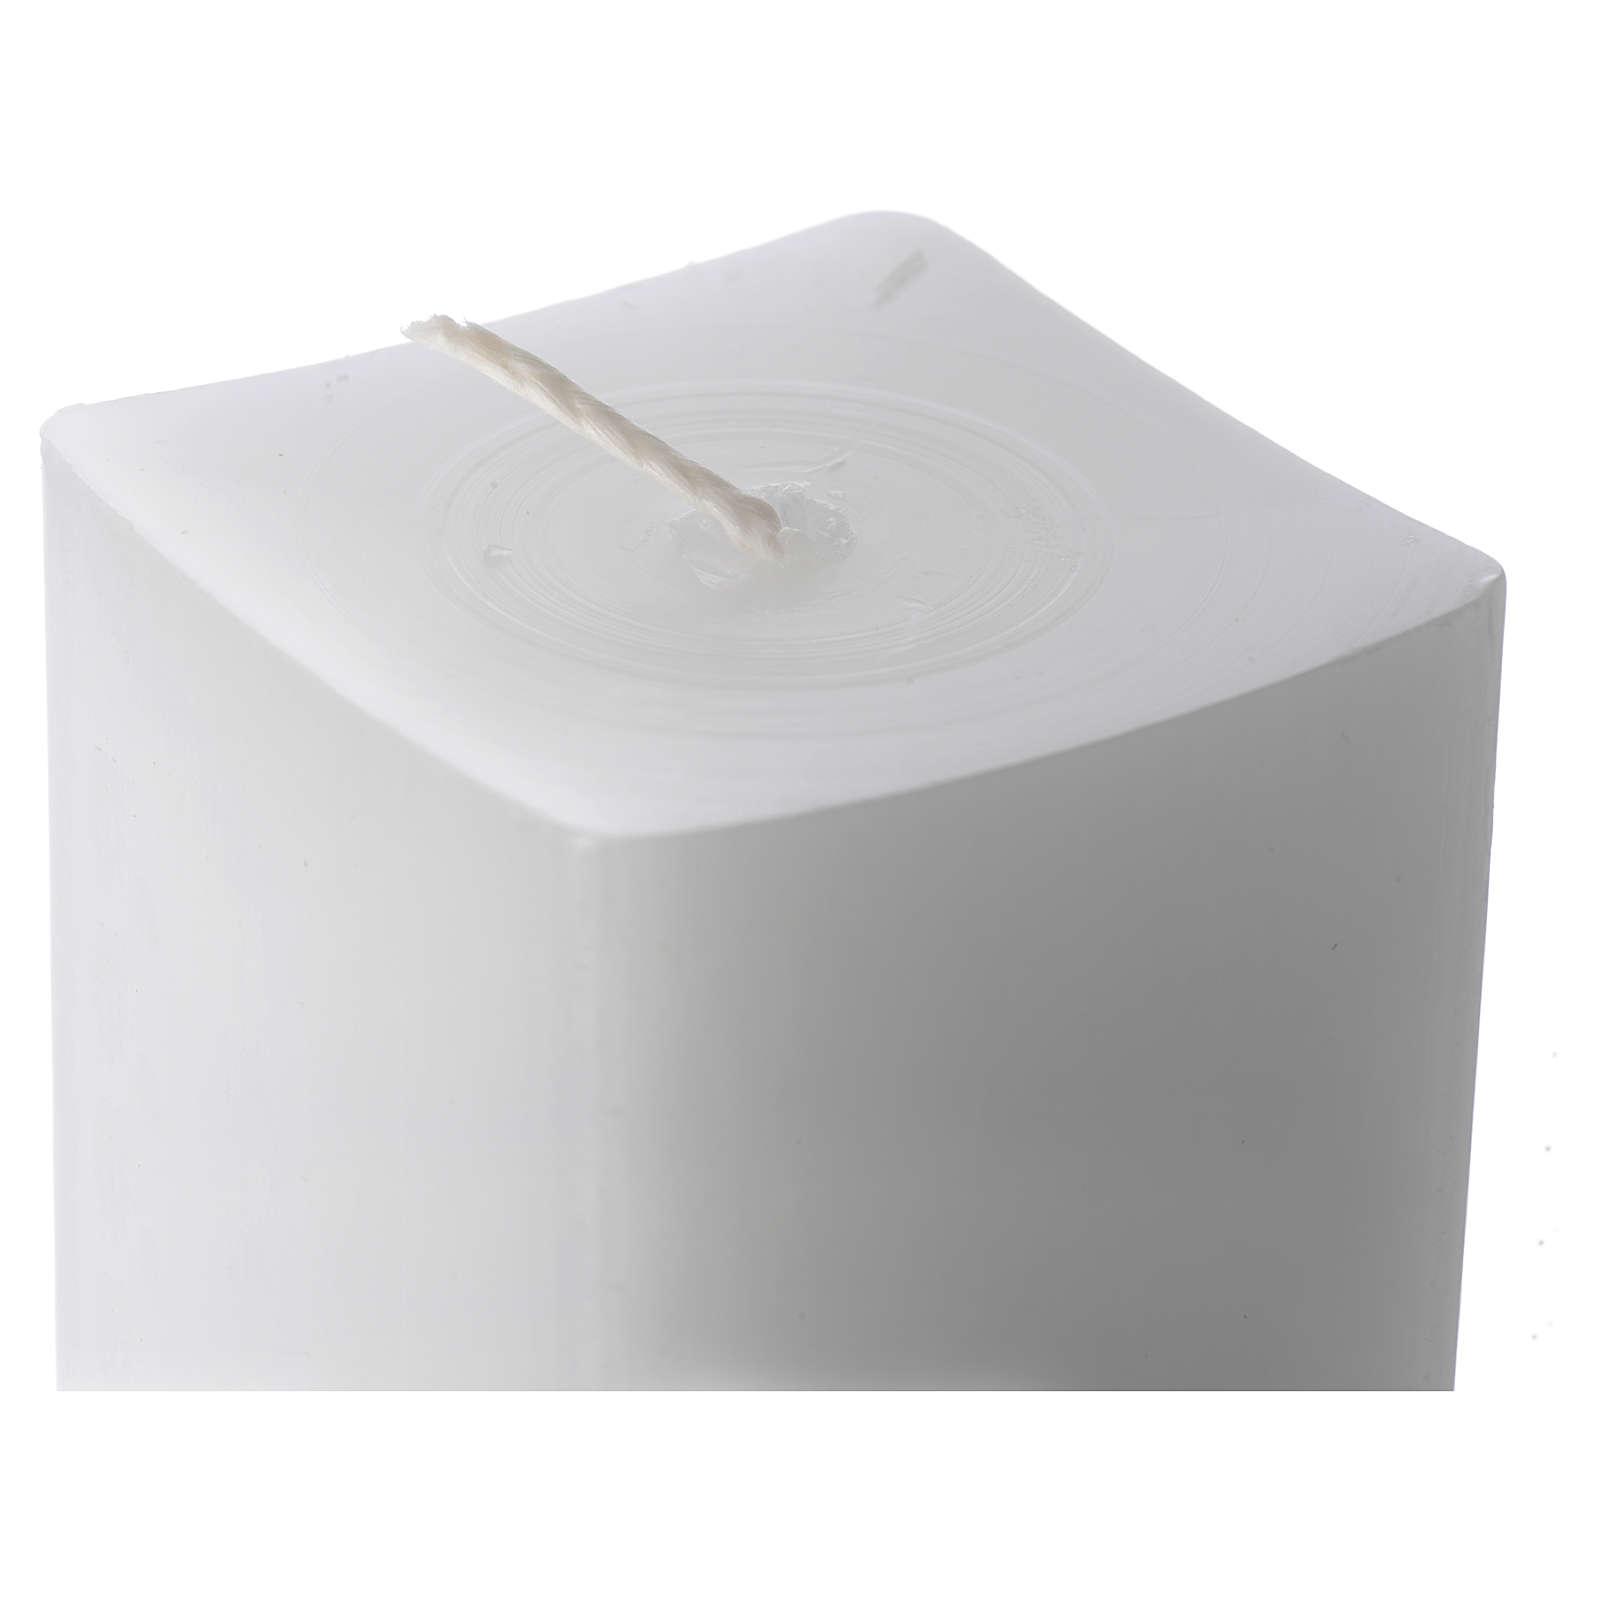 Vela blanca cuadrada 800x50x50 mm (paquete) 3